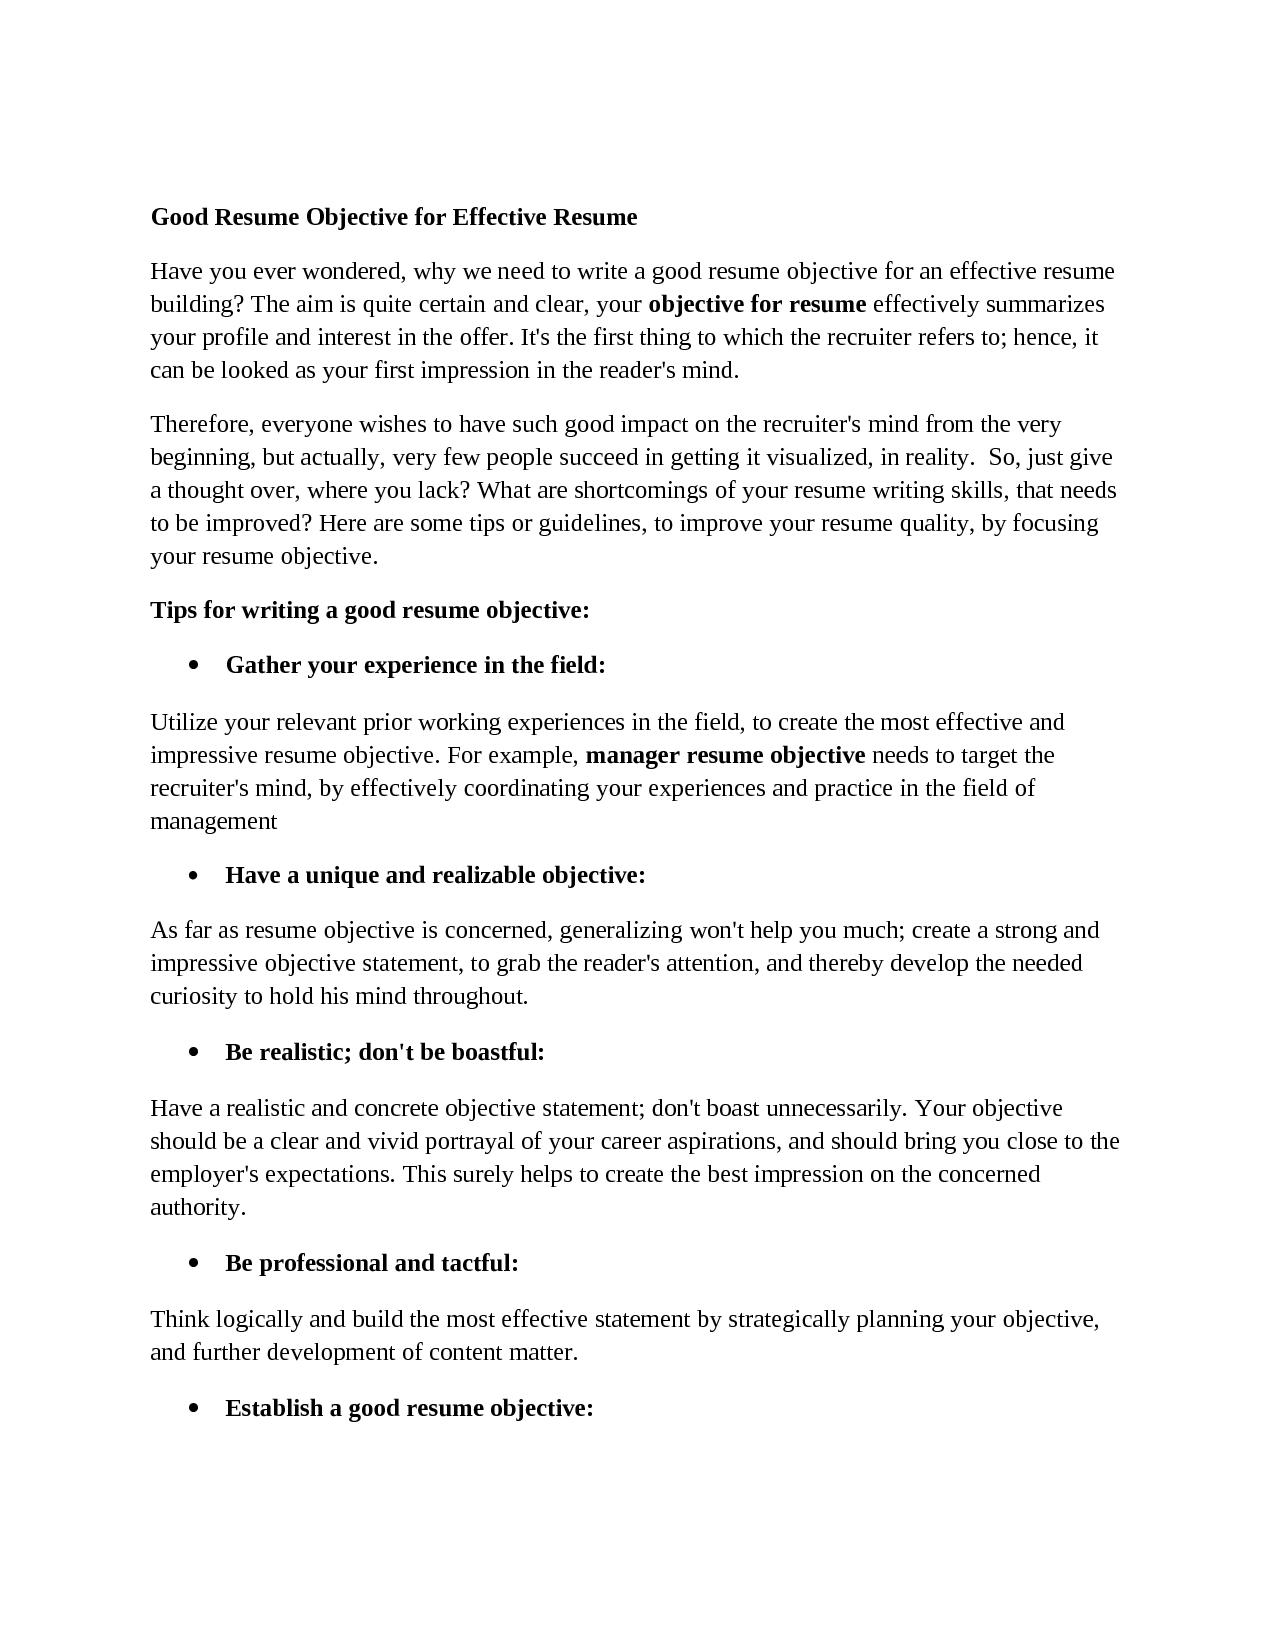 Creative writing major emory